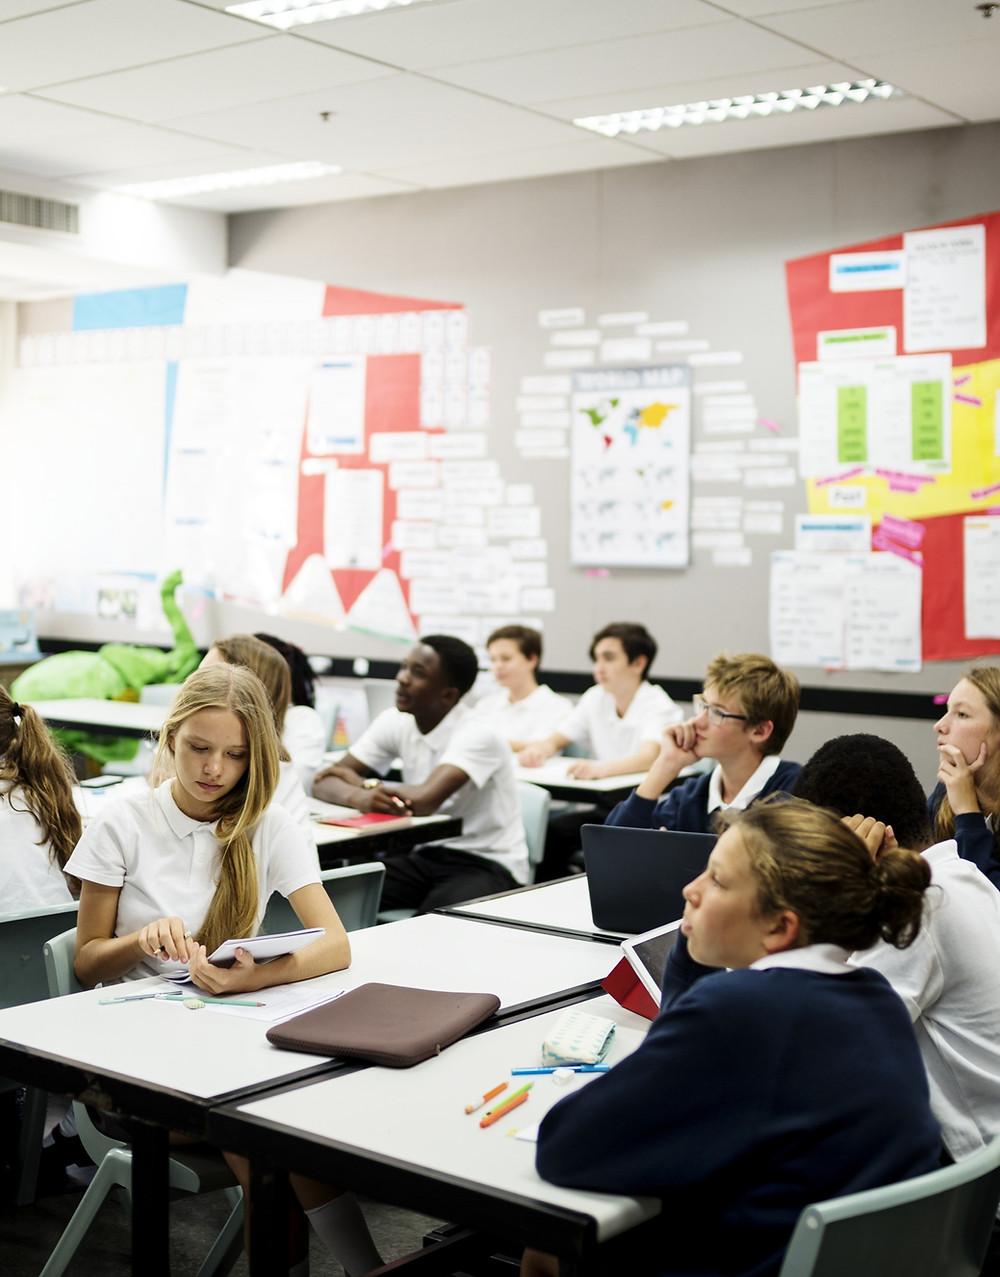 Secondary school classroom - students receiving RSE